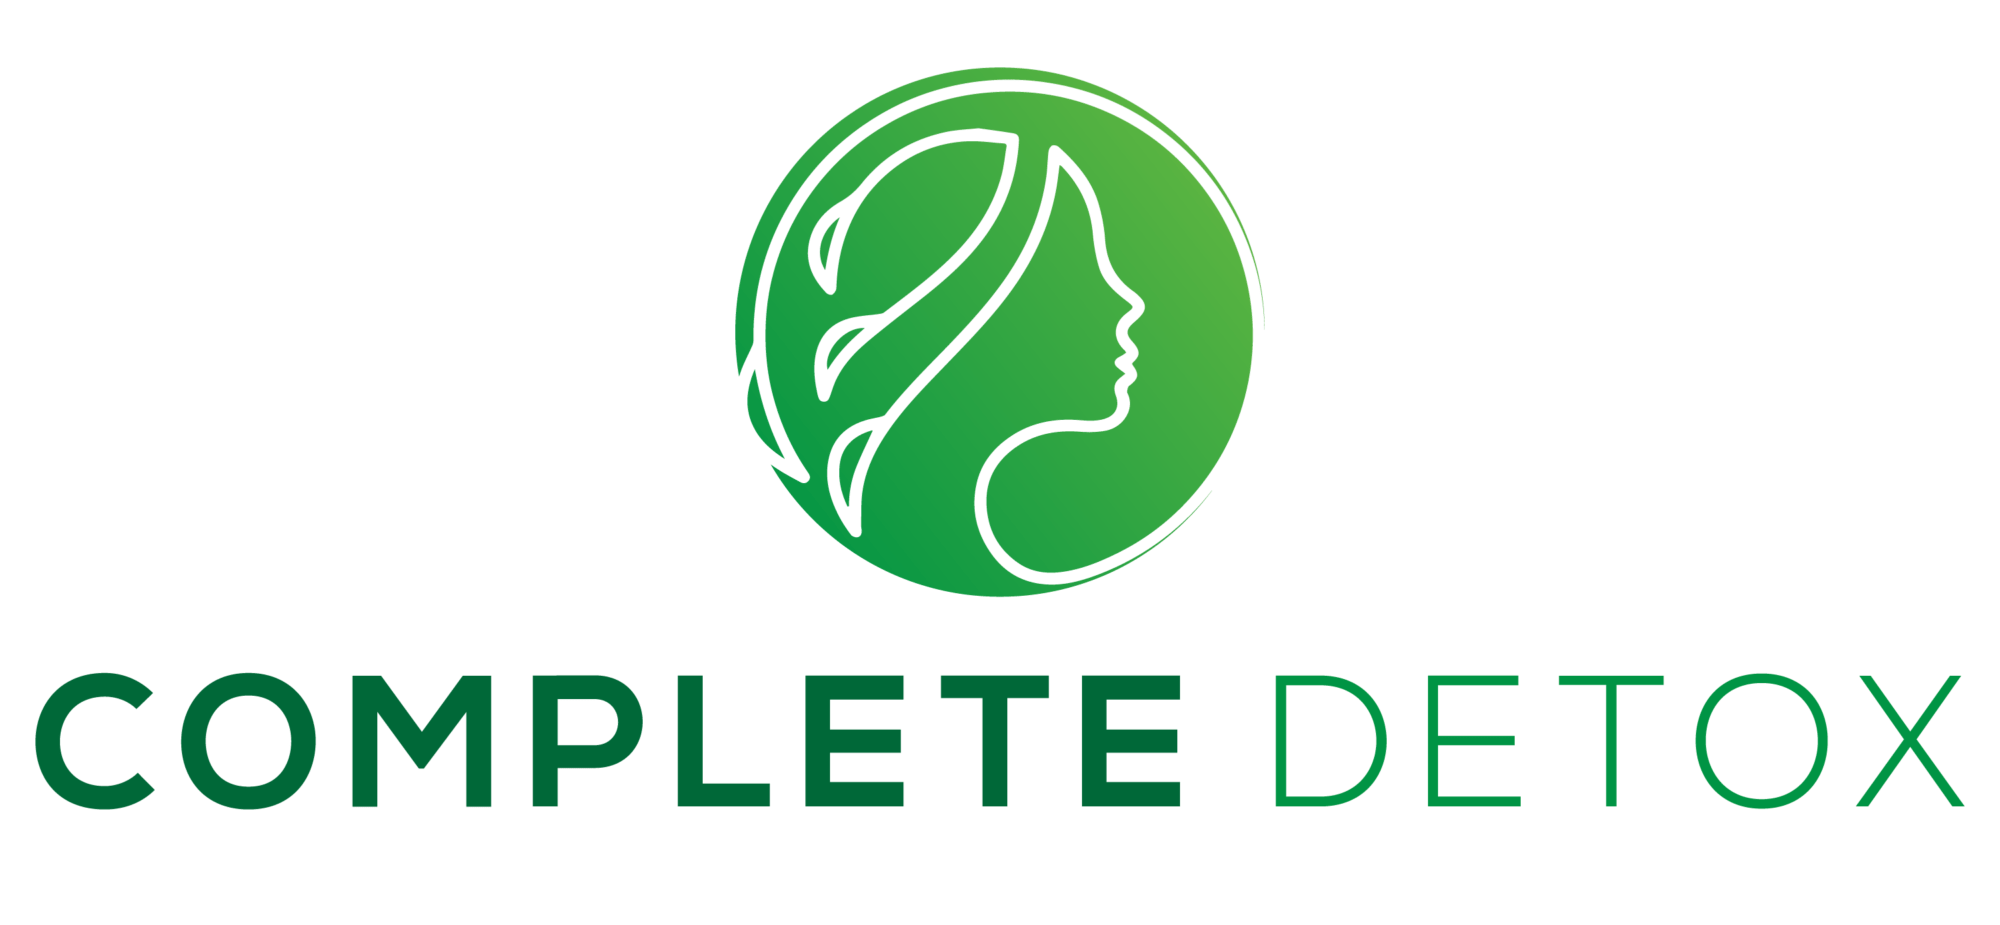 Complete Detox mobile